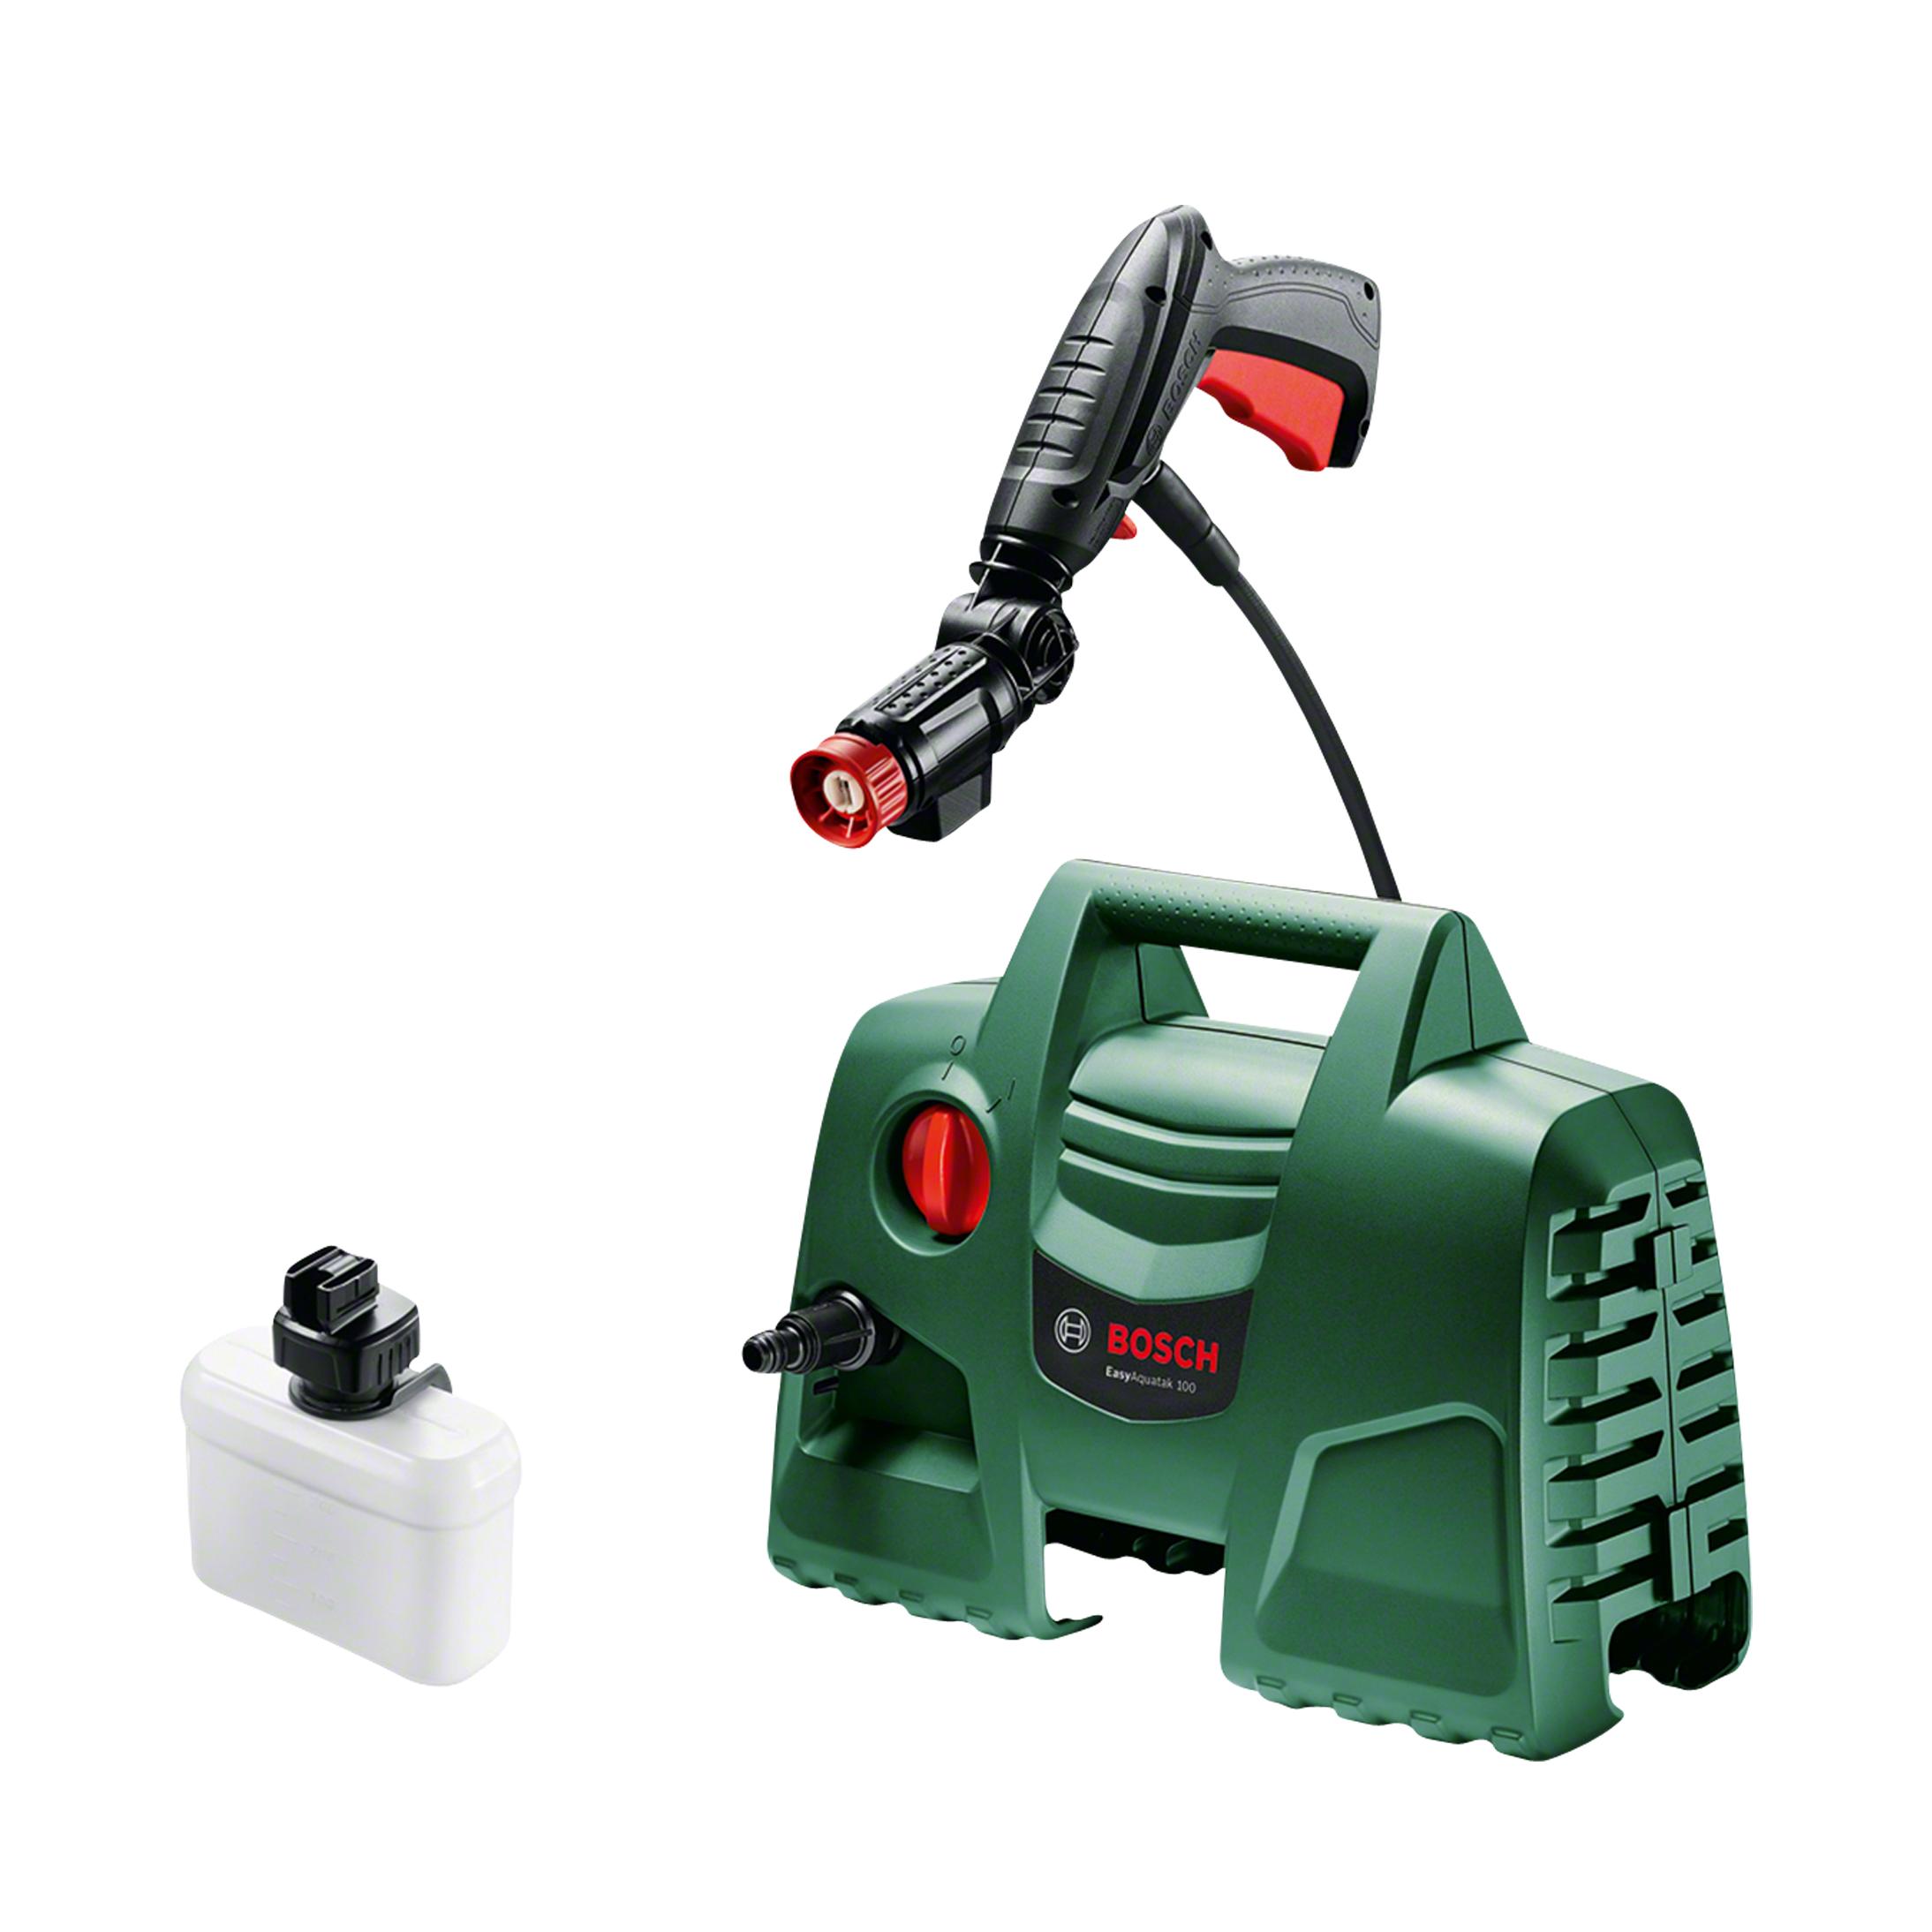 Bosch Idropulitrice  Easy Aquatak 100